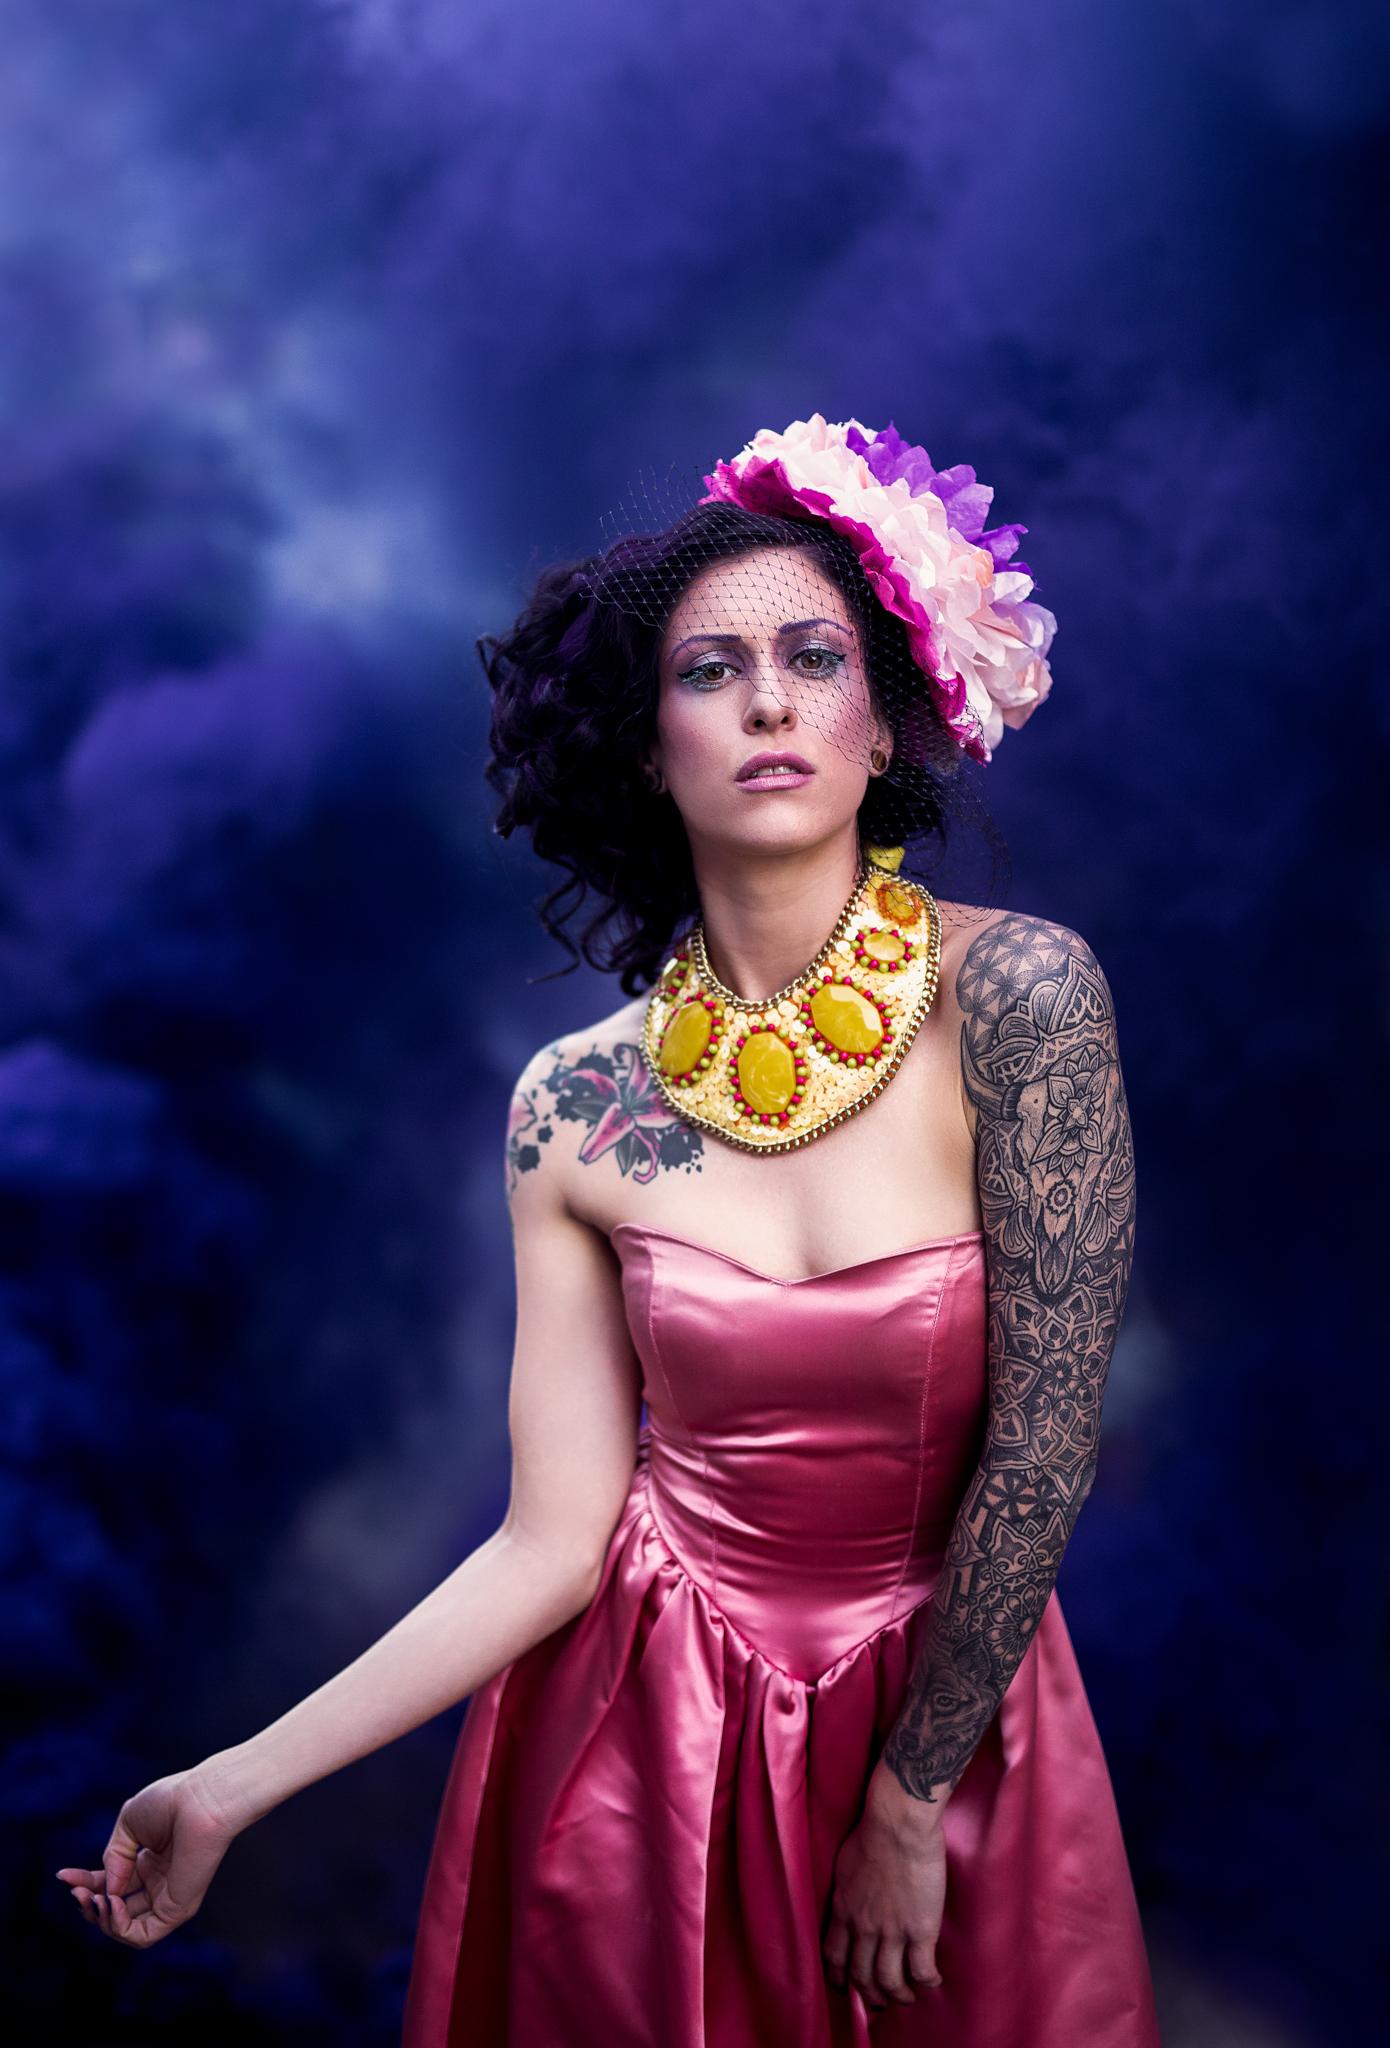 Denver Rino Fashion Photographer